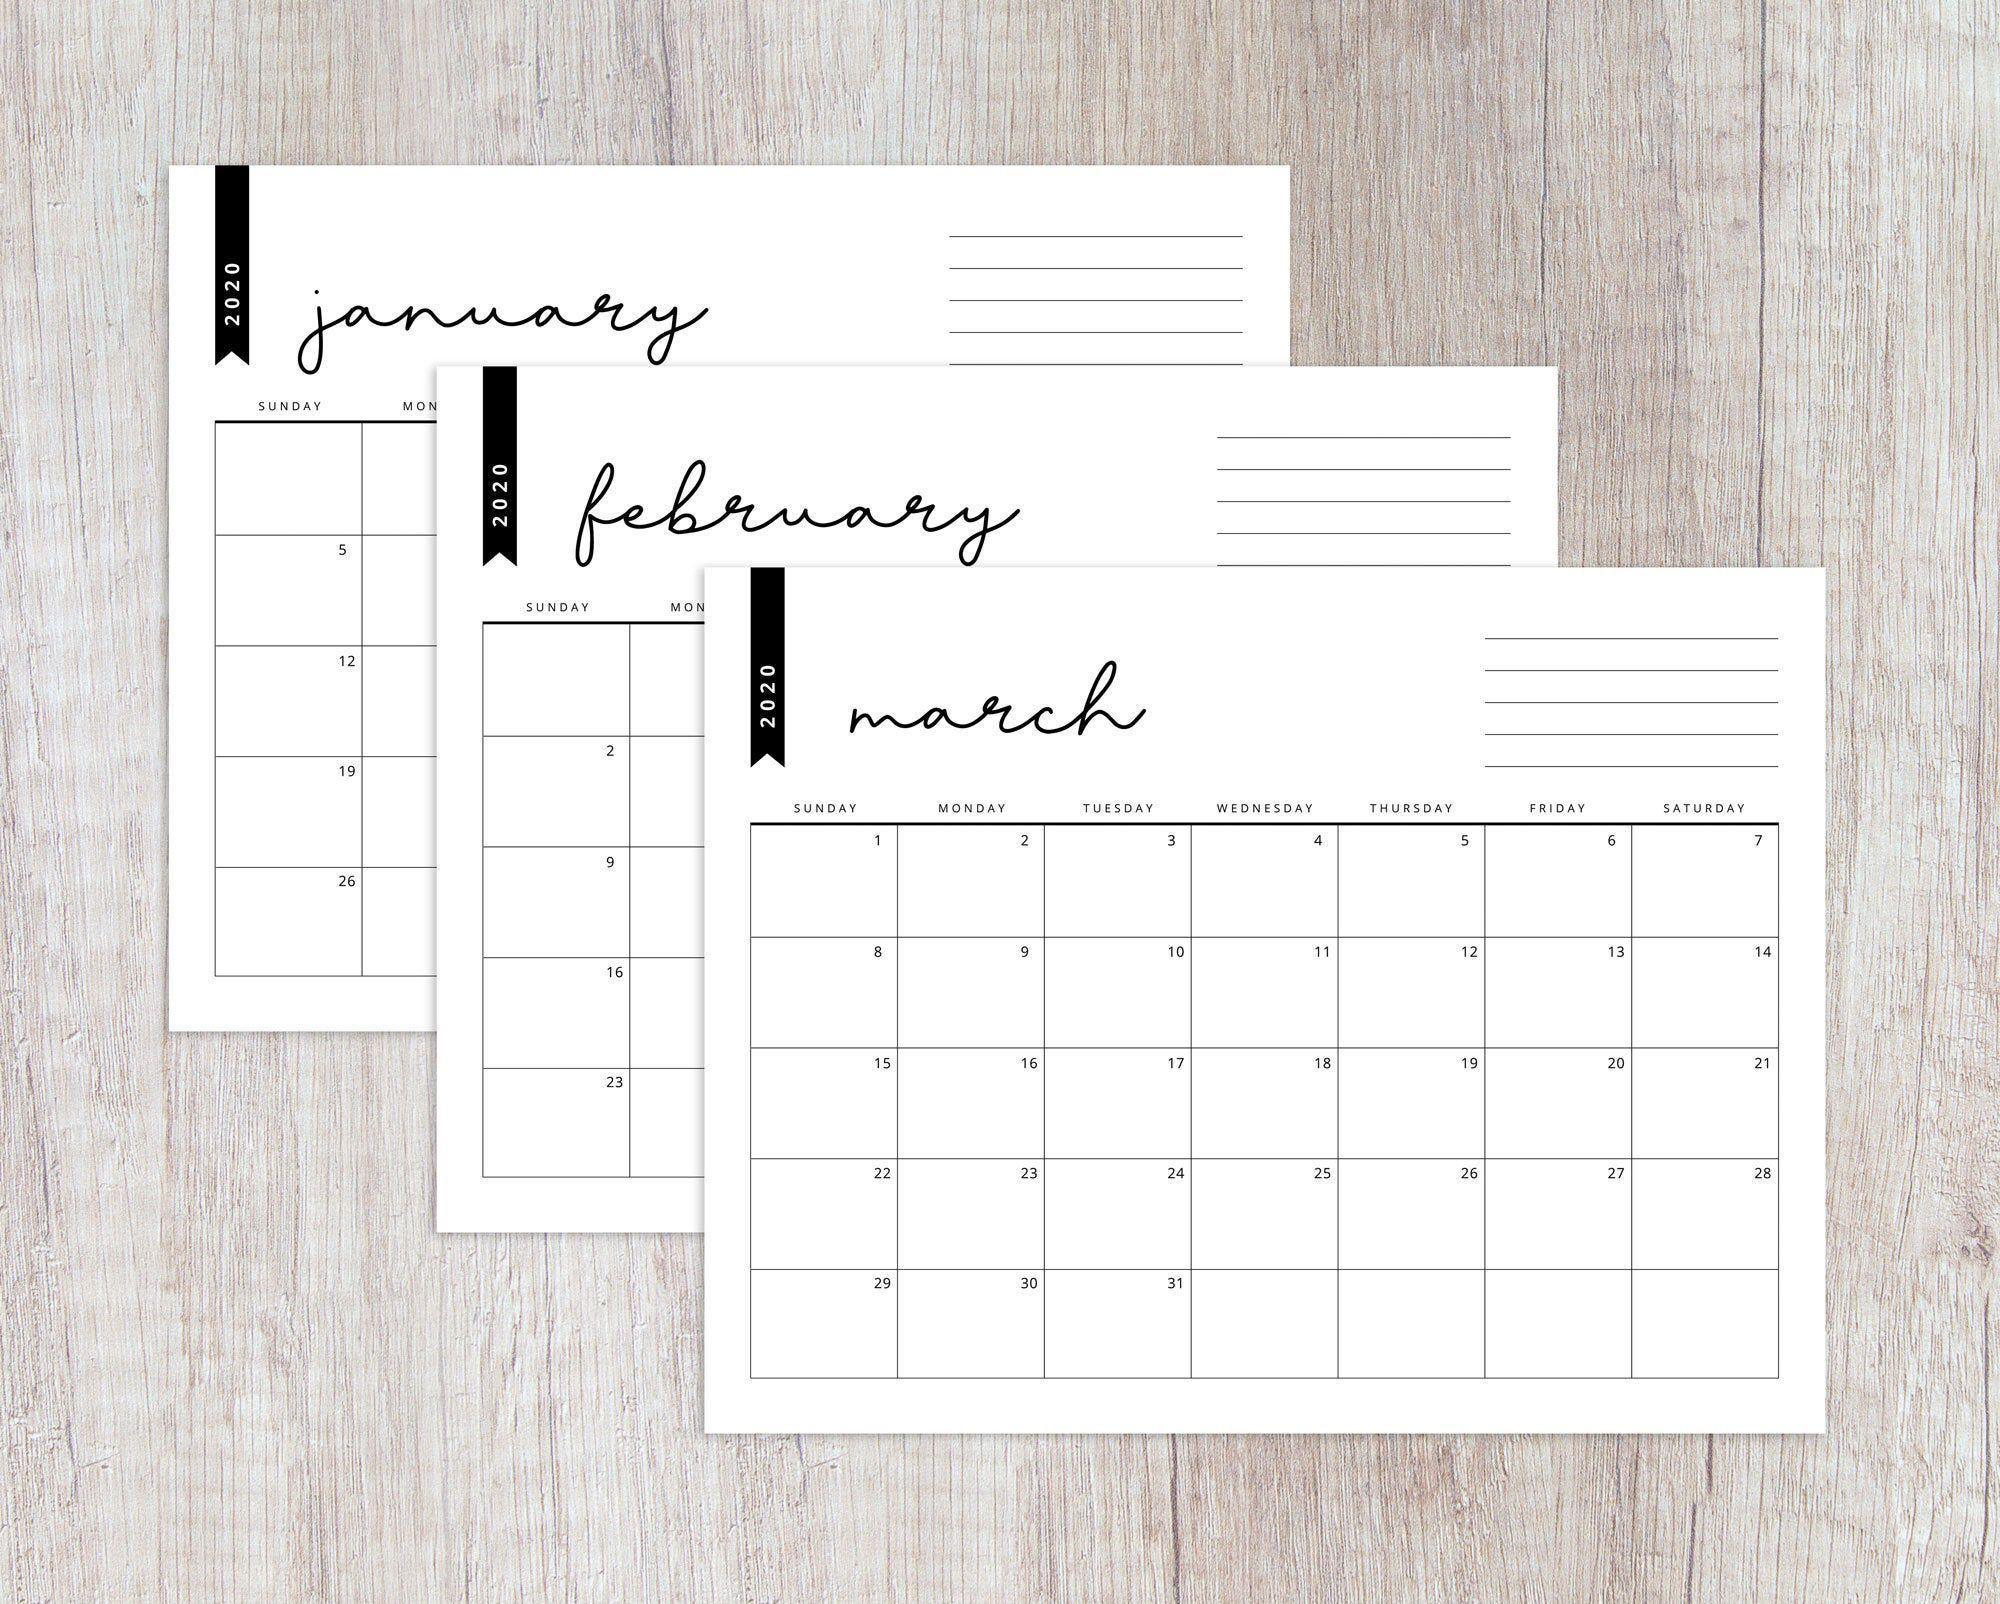 Printable 2020 Horizontal Calendar Letter Size Landscape Orientation Modern Calendar Minimalist Chic Calligraphic Calendar With Note Area Modern Calendar Minimalist Calendar Lettering